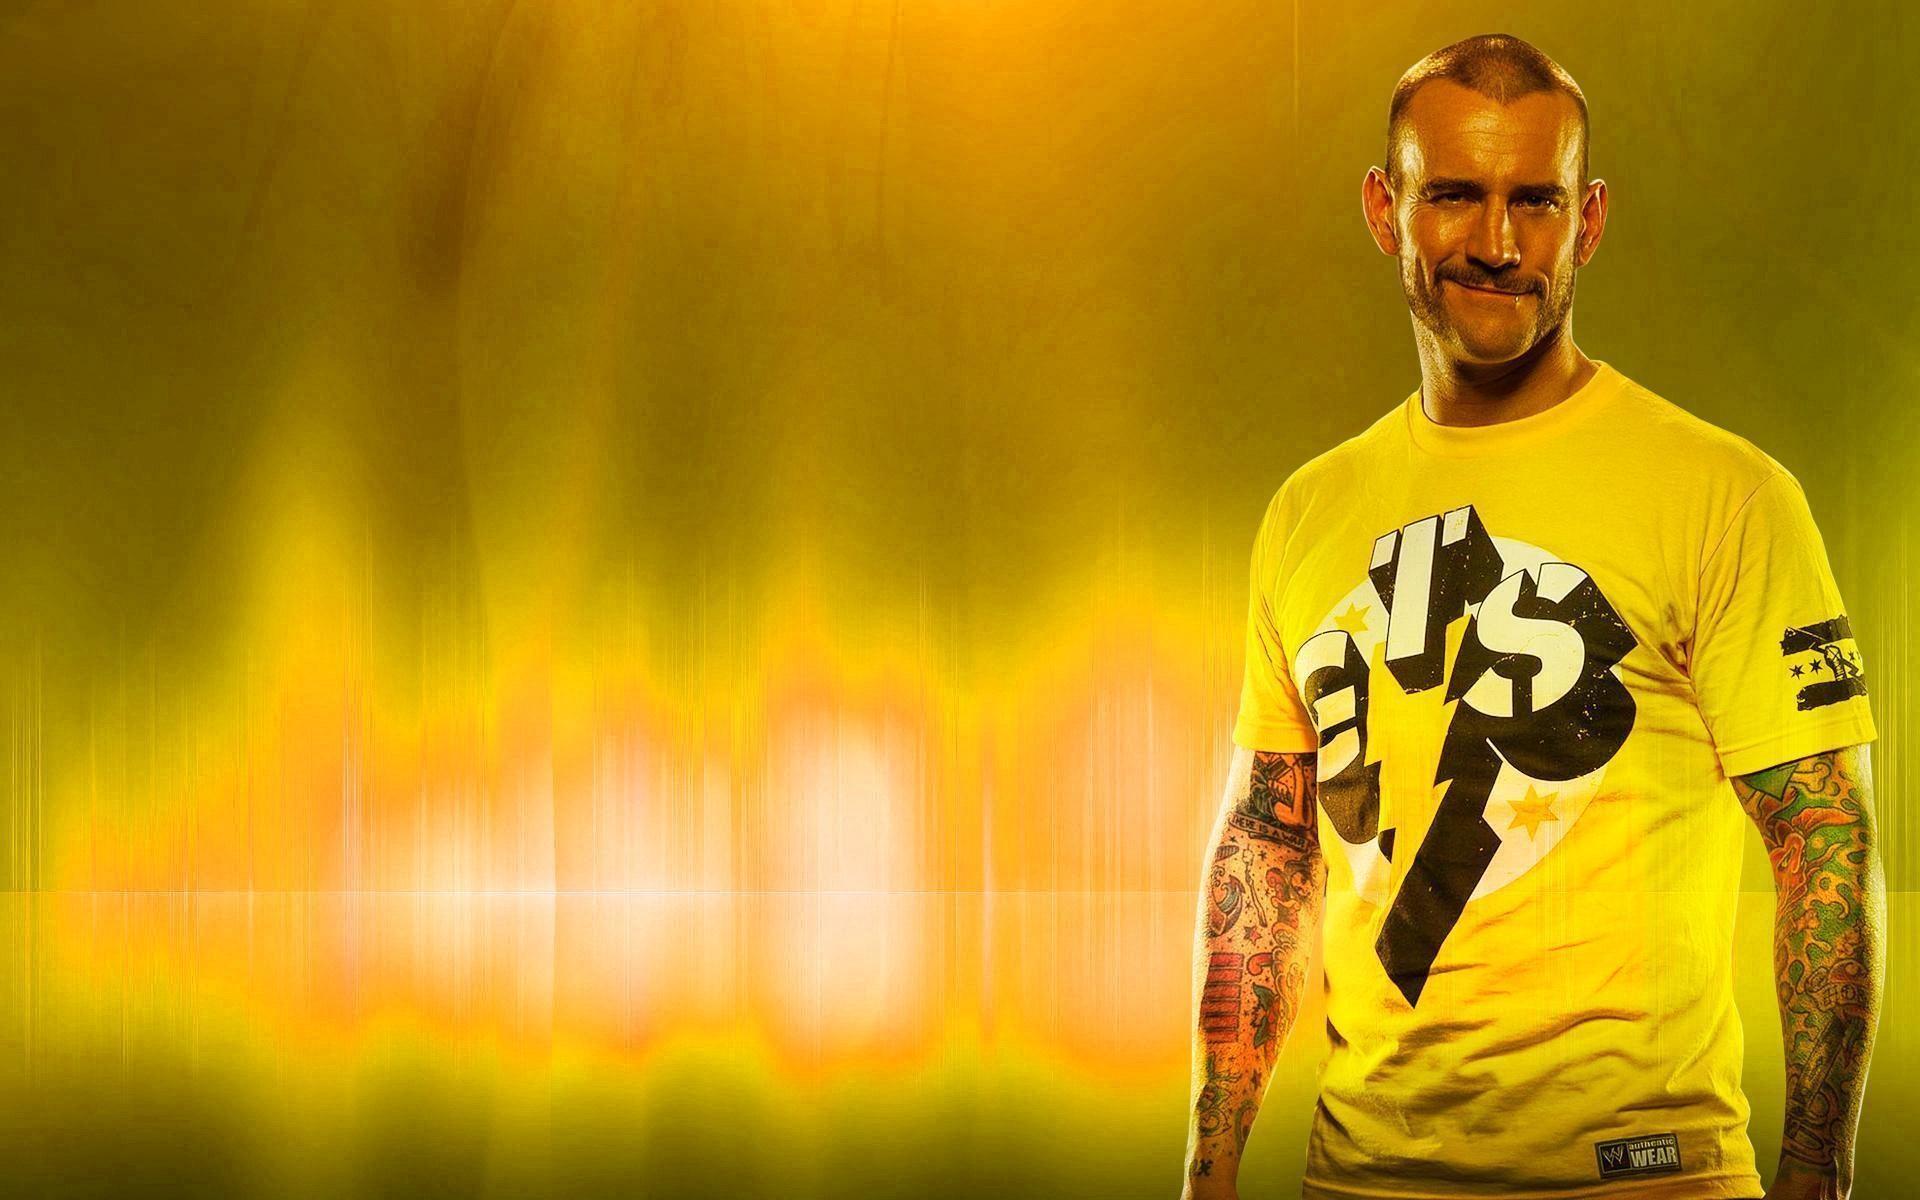 CM Punk Hd Wallpaper | Hd Wallpapers